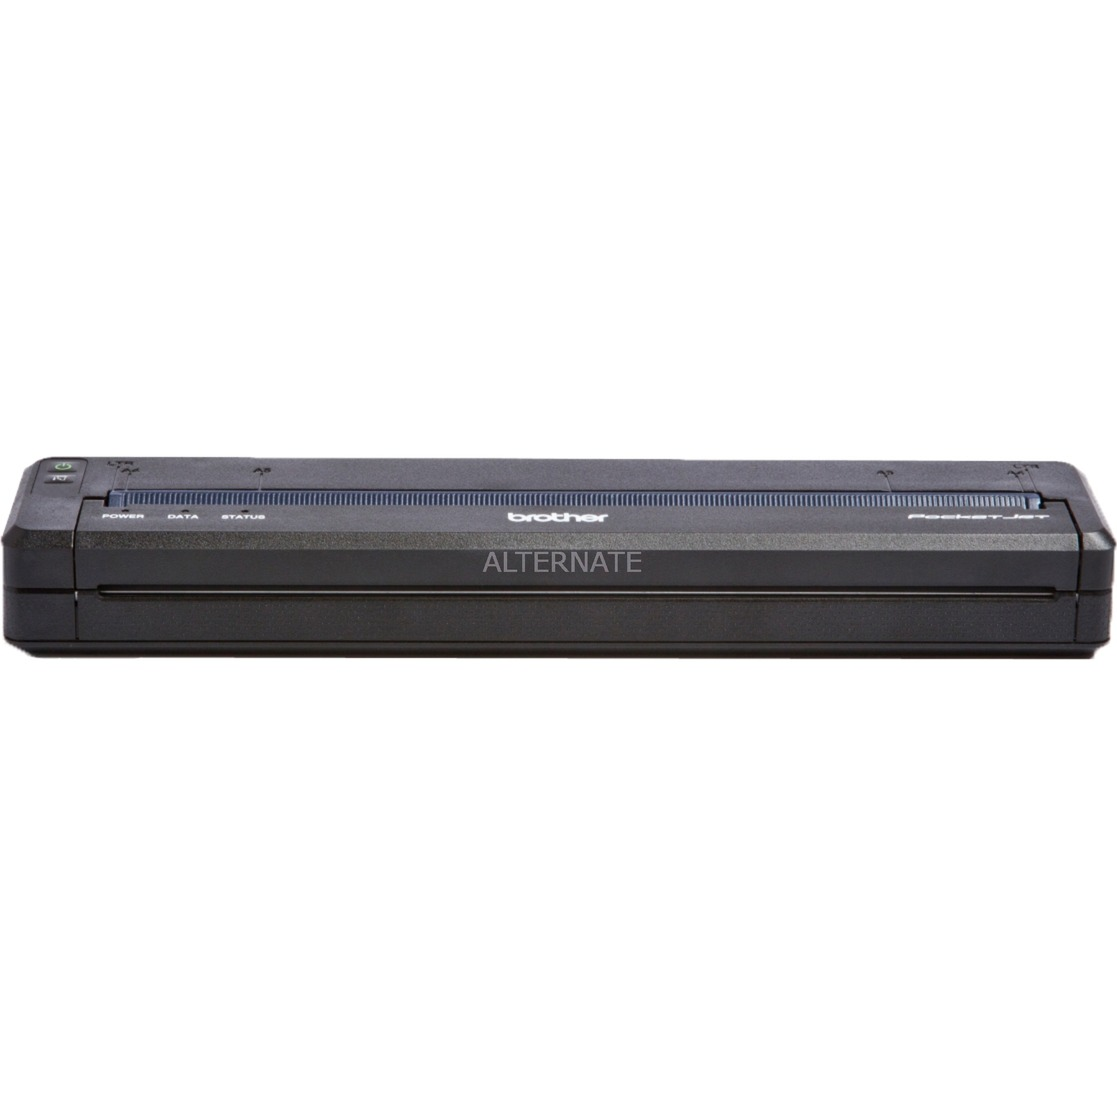 PJ- 762 A4 200dpiw Bluetooth, Impresora térmica